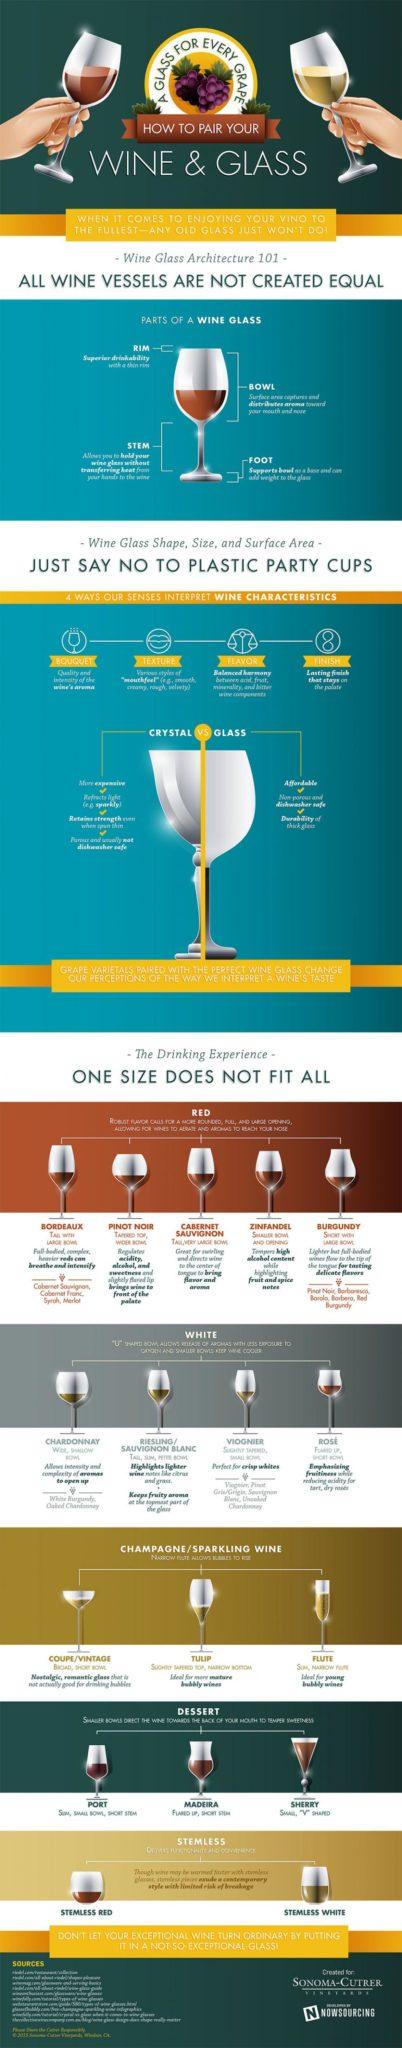 sc_infographic_wine_glass_900